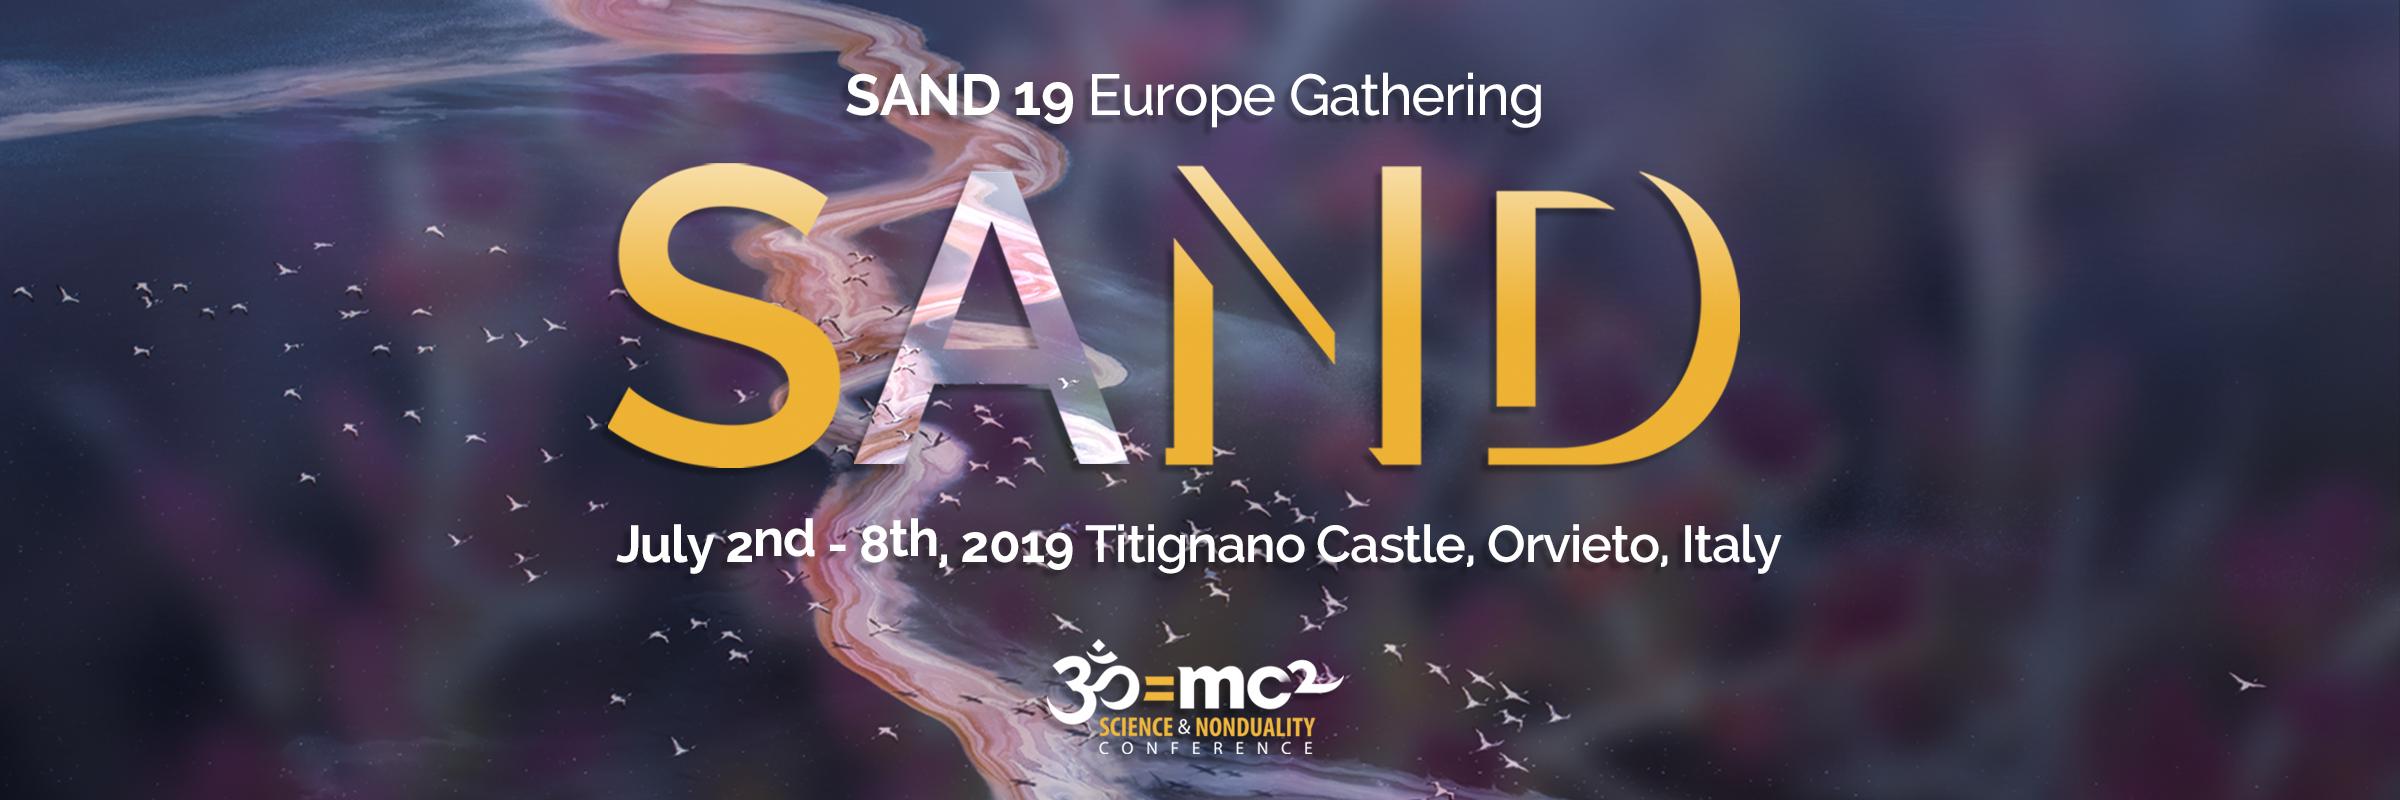 SAND19 Italy